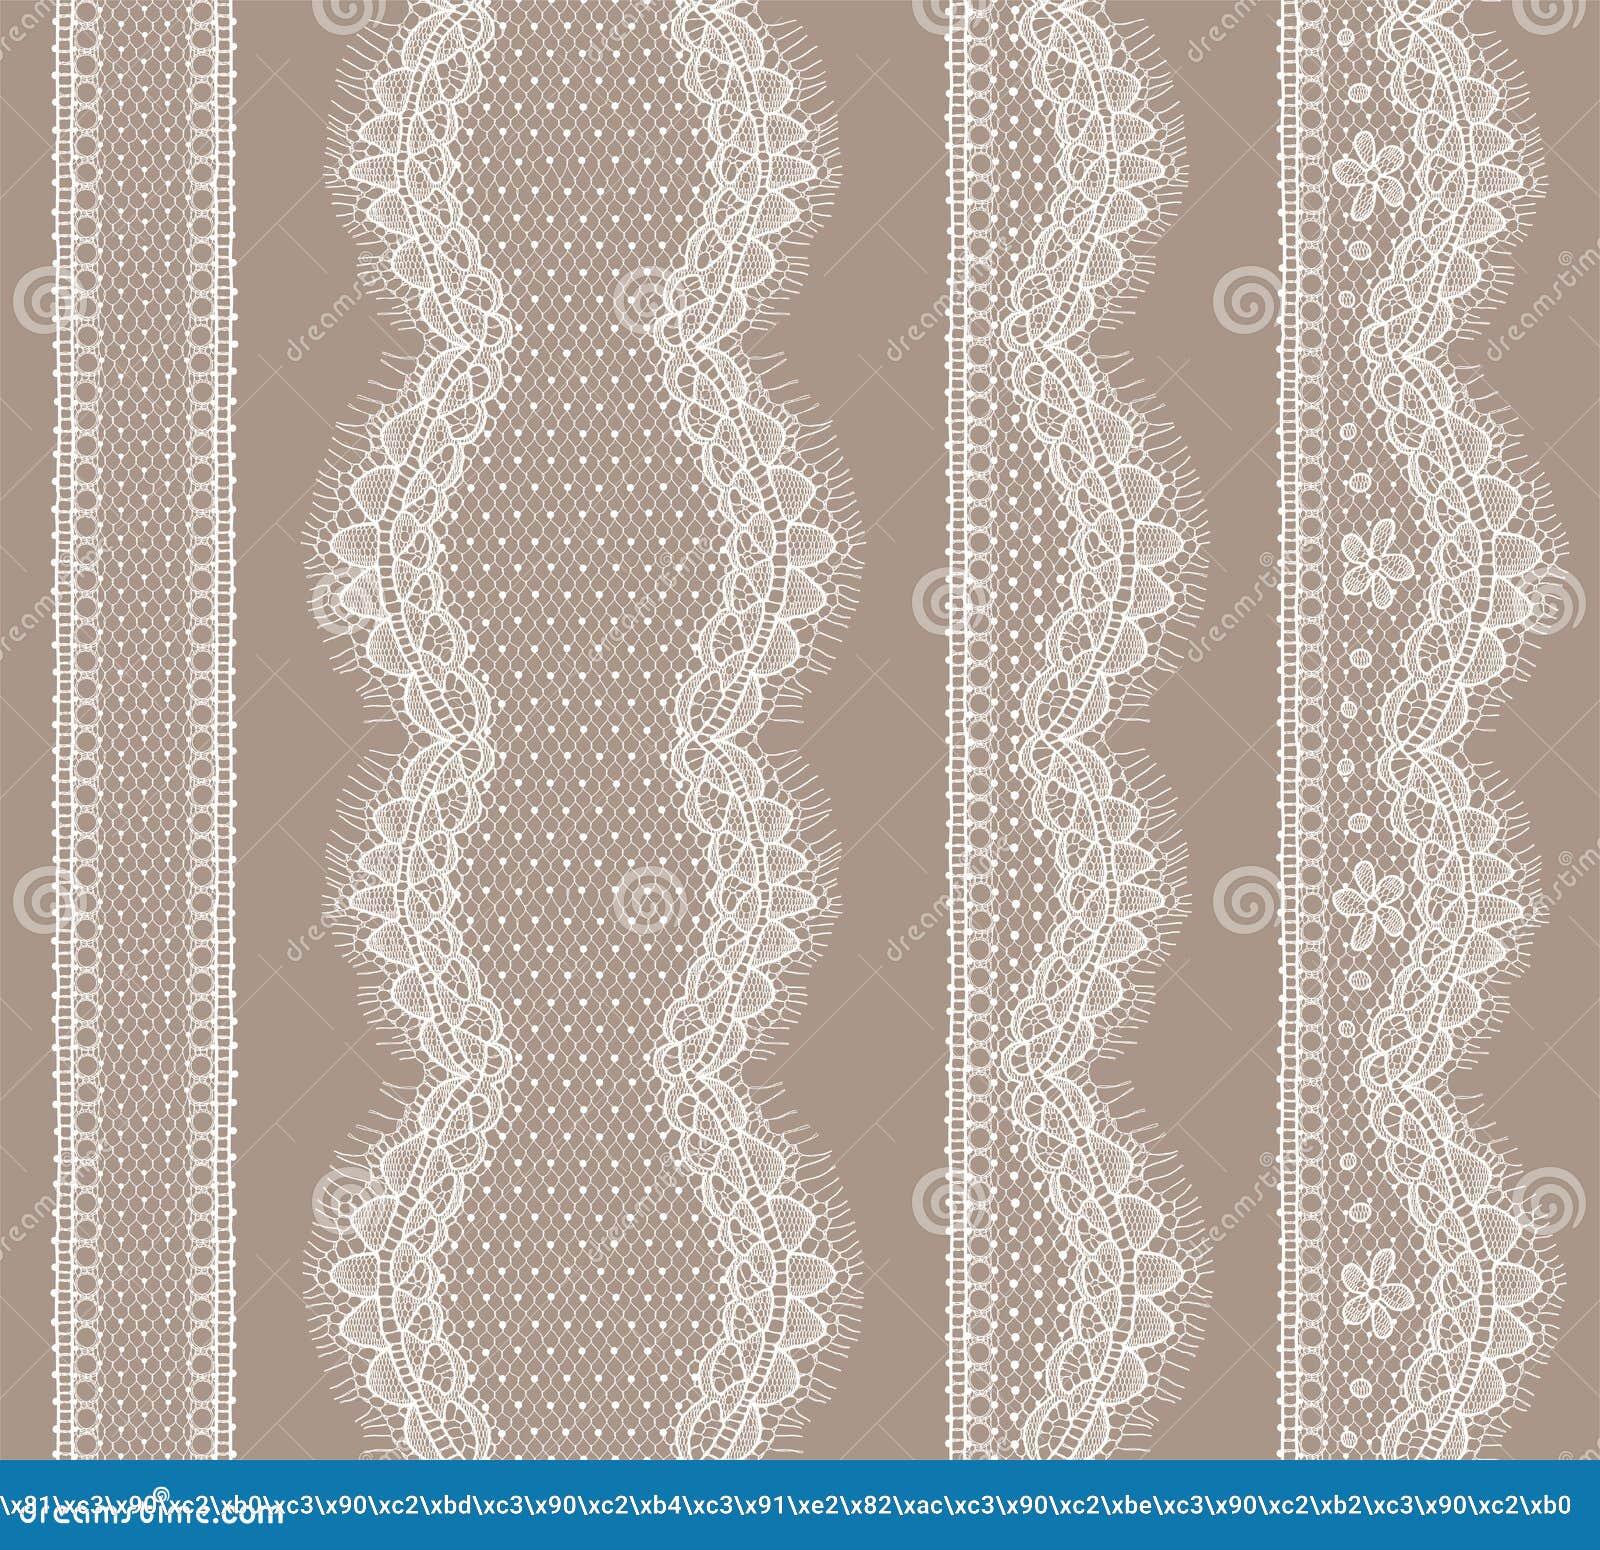 spitze band nahtloses muster vektor abbildung bild 54664937. Black Bedroom Furniture Sets. Home Design Ideas